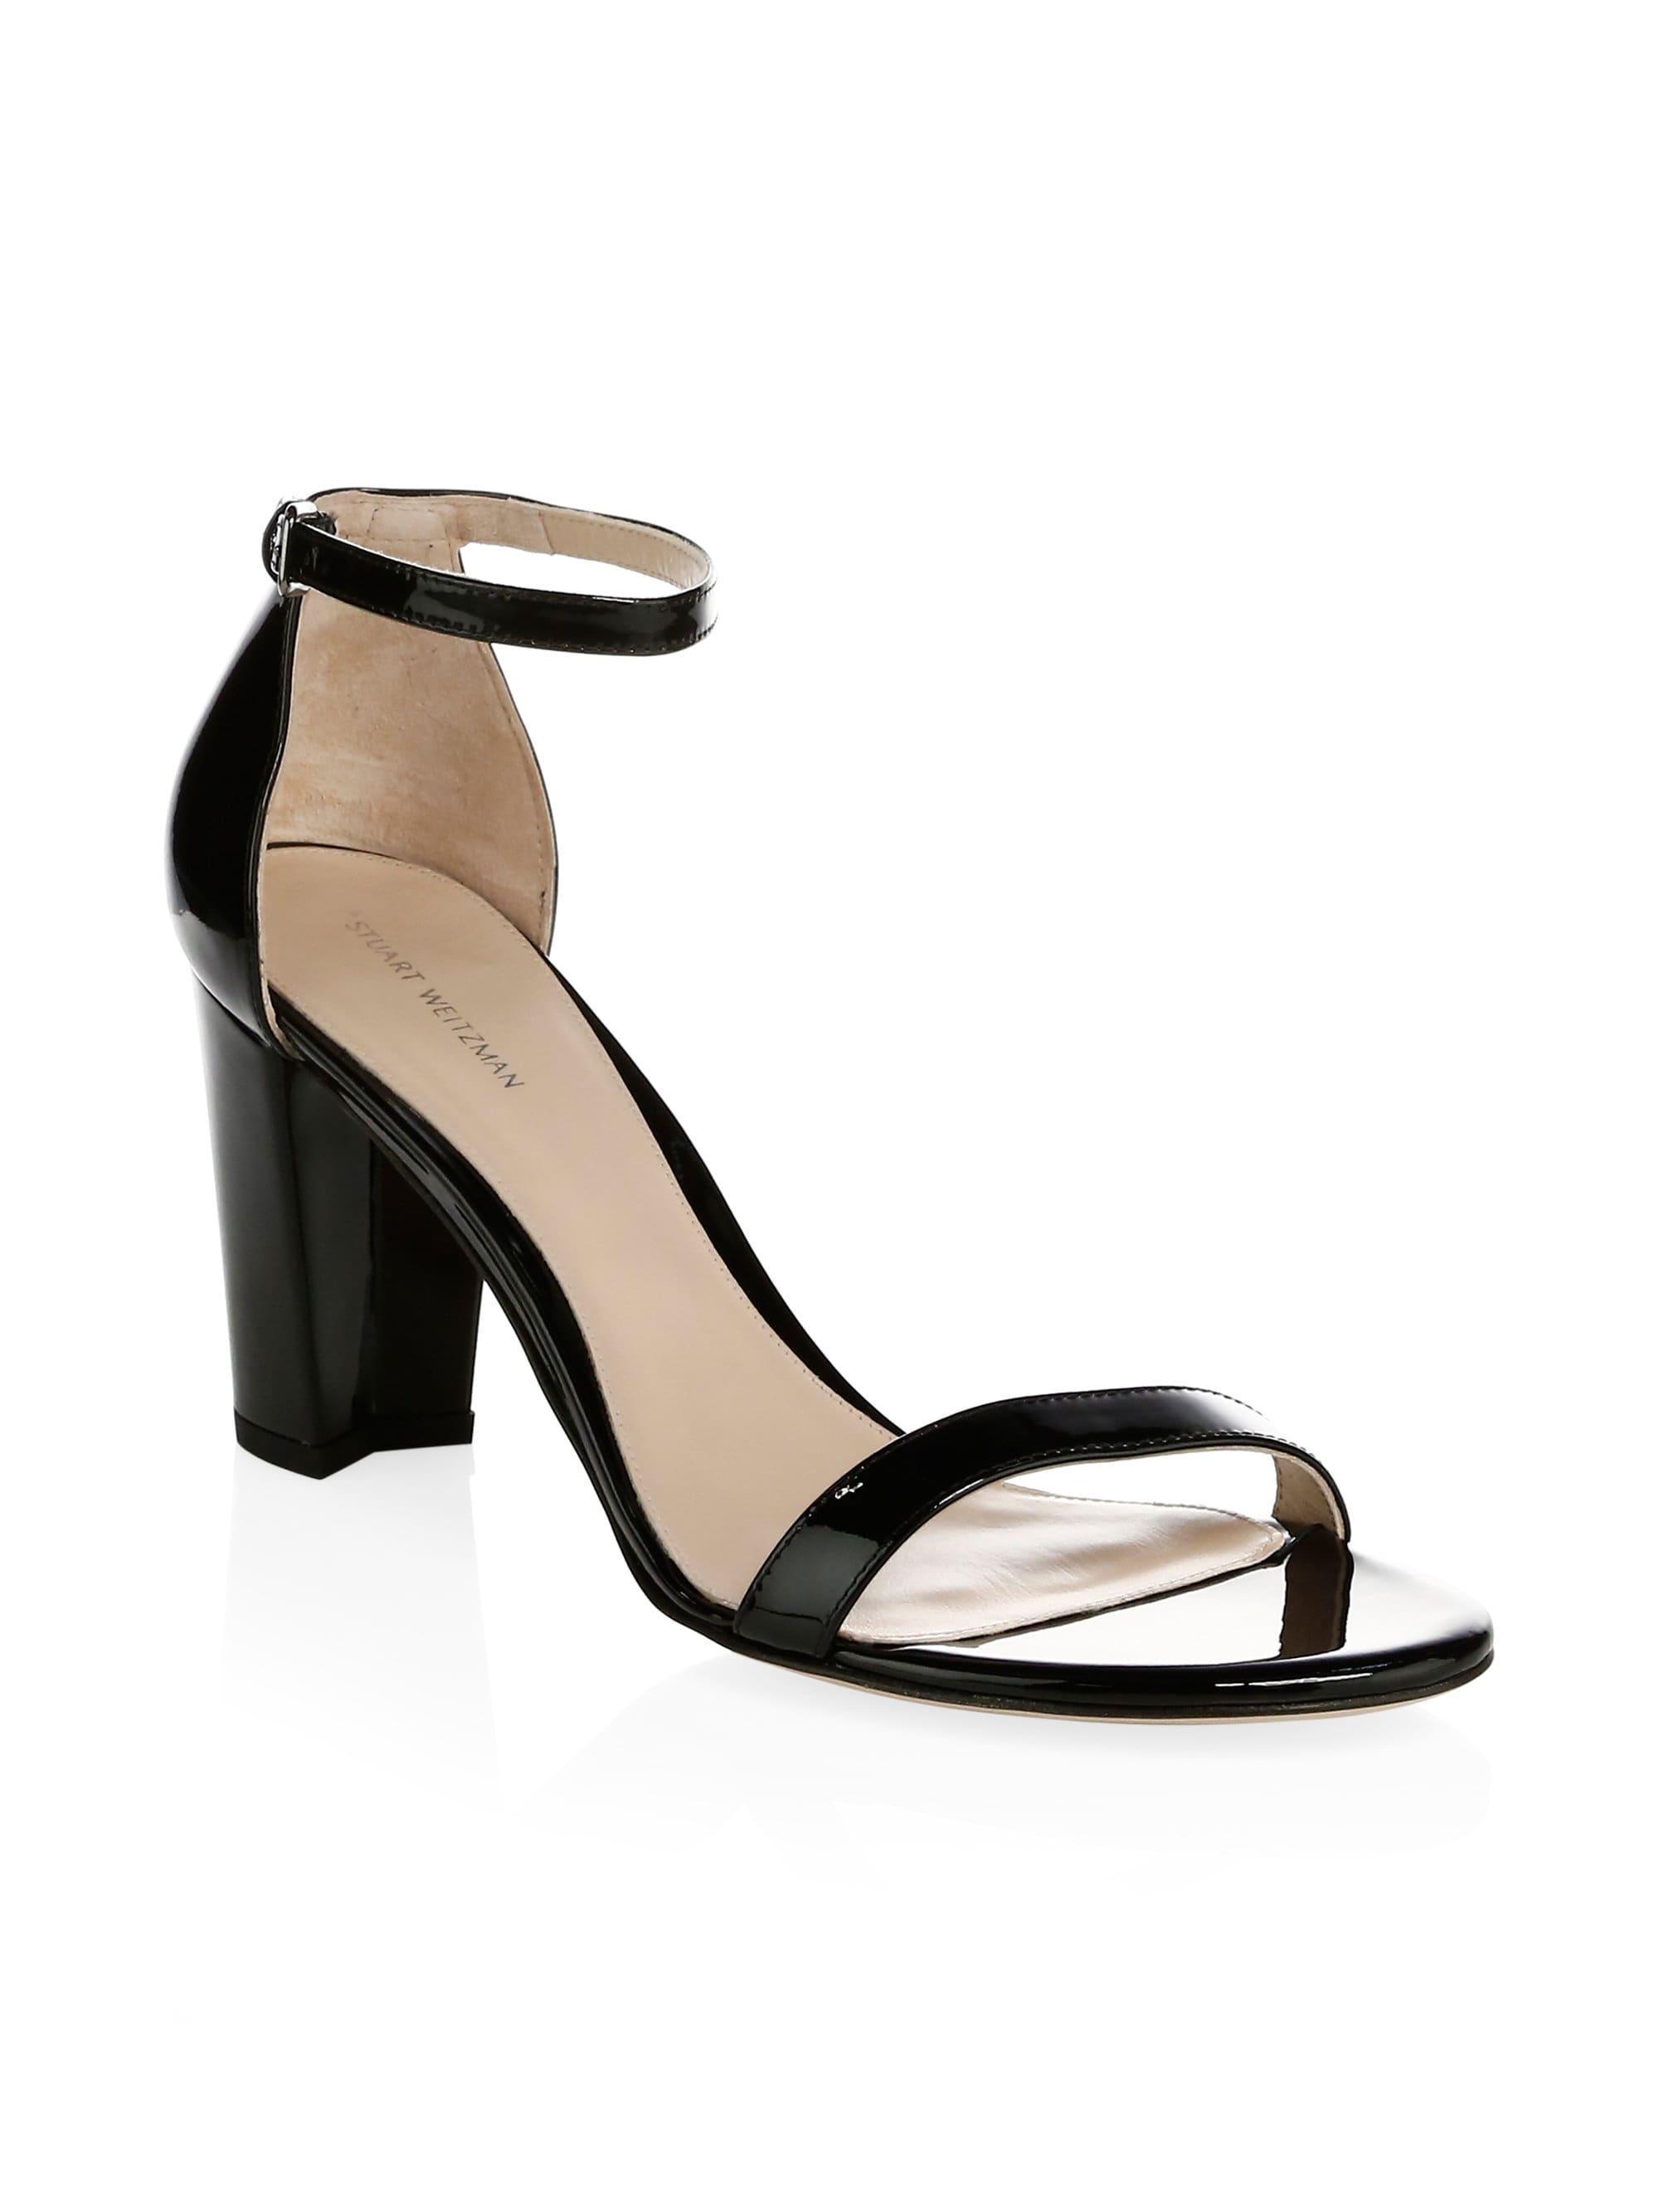 087a3254ec Stuart Weitzman - Black Nearlynude Patent Leather Block Heel Sandals -  Lyst. View fullscreen